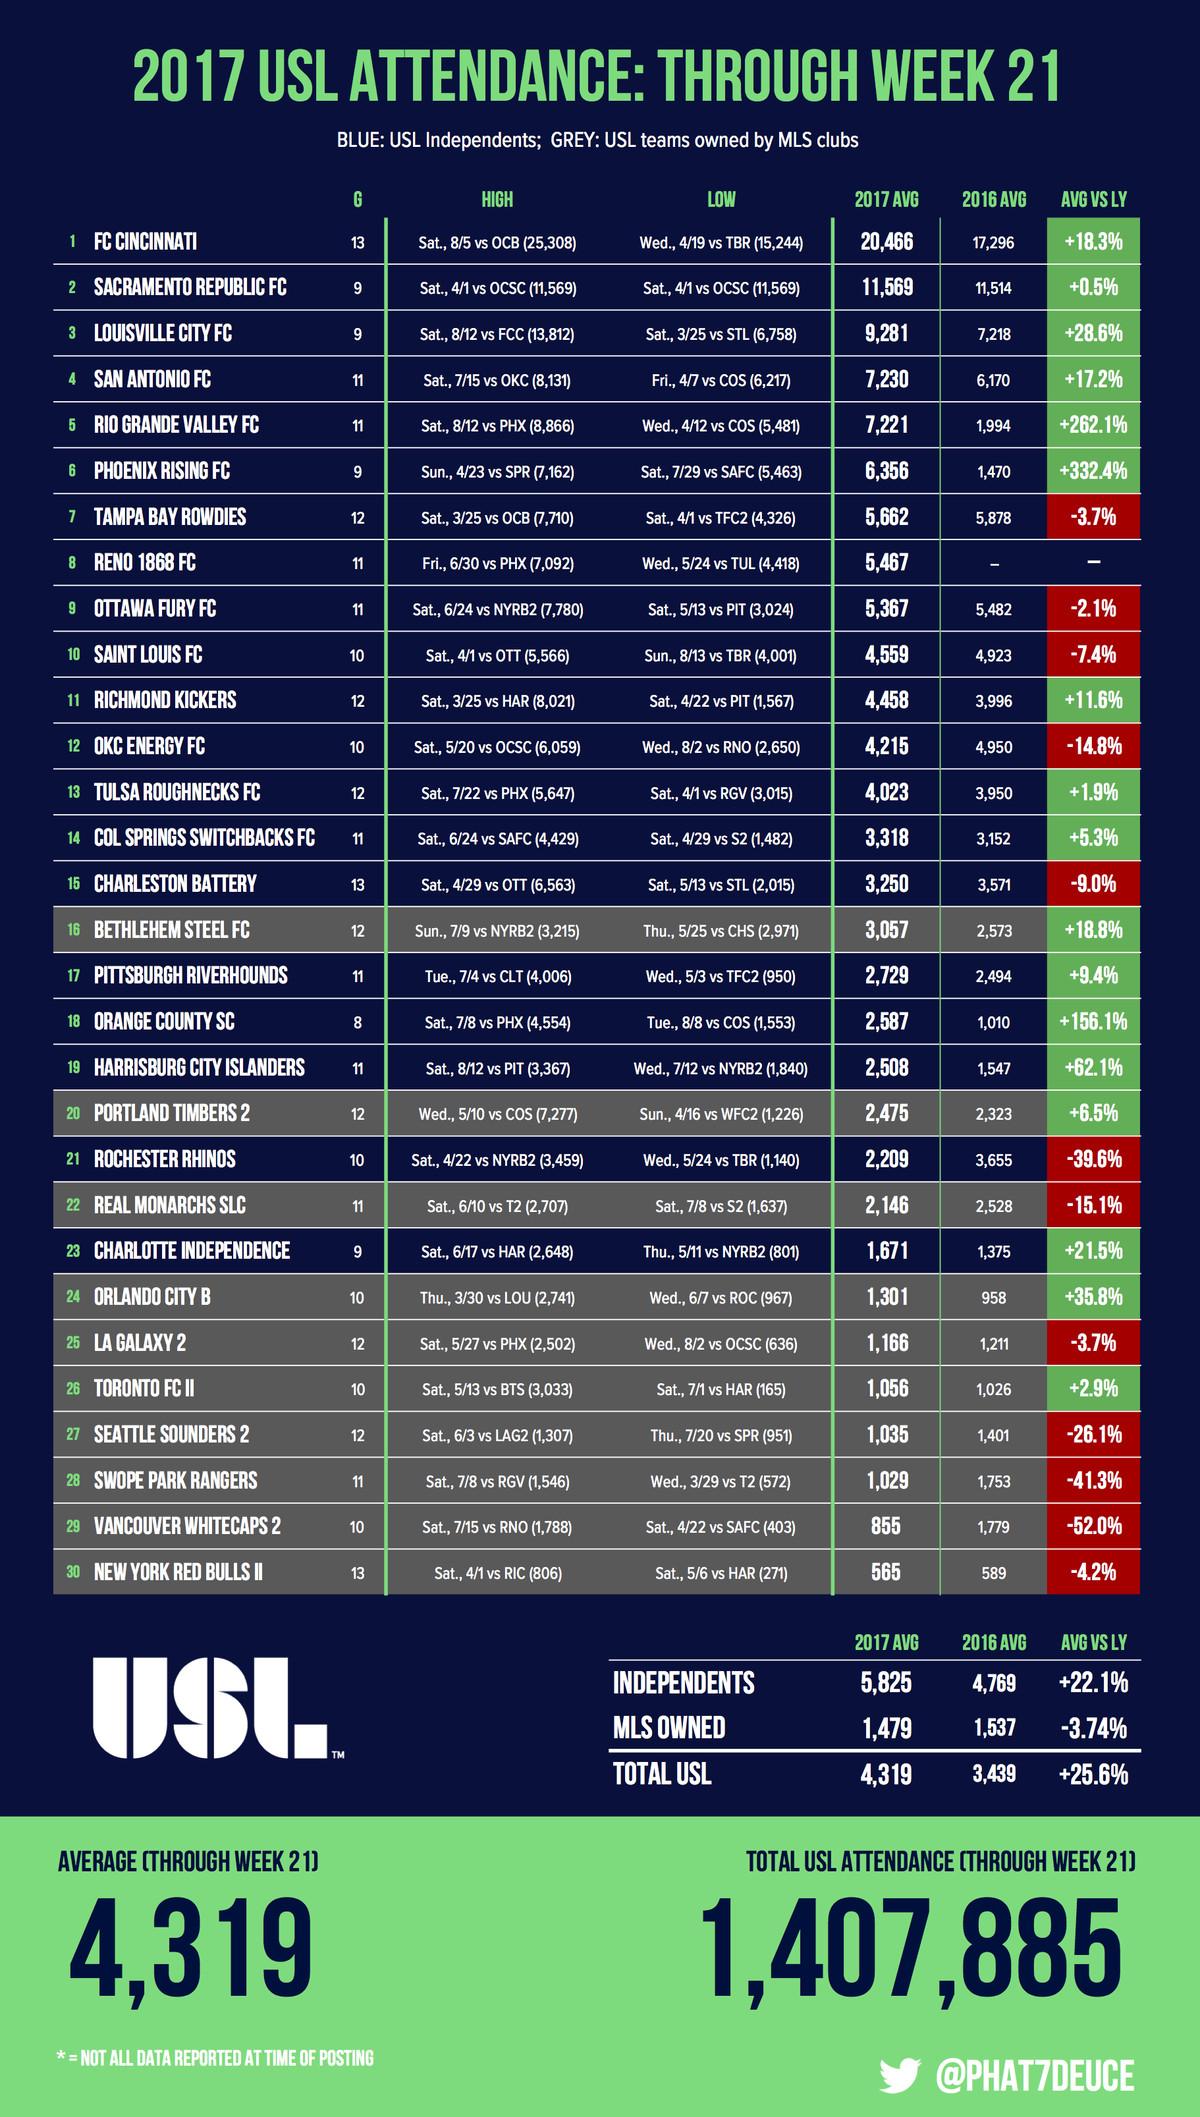 USL Total Attendance Through Week 21